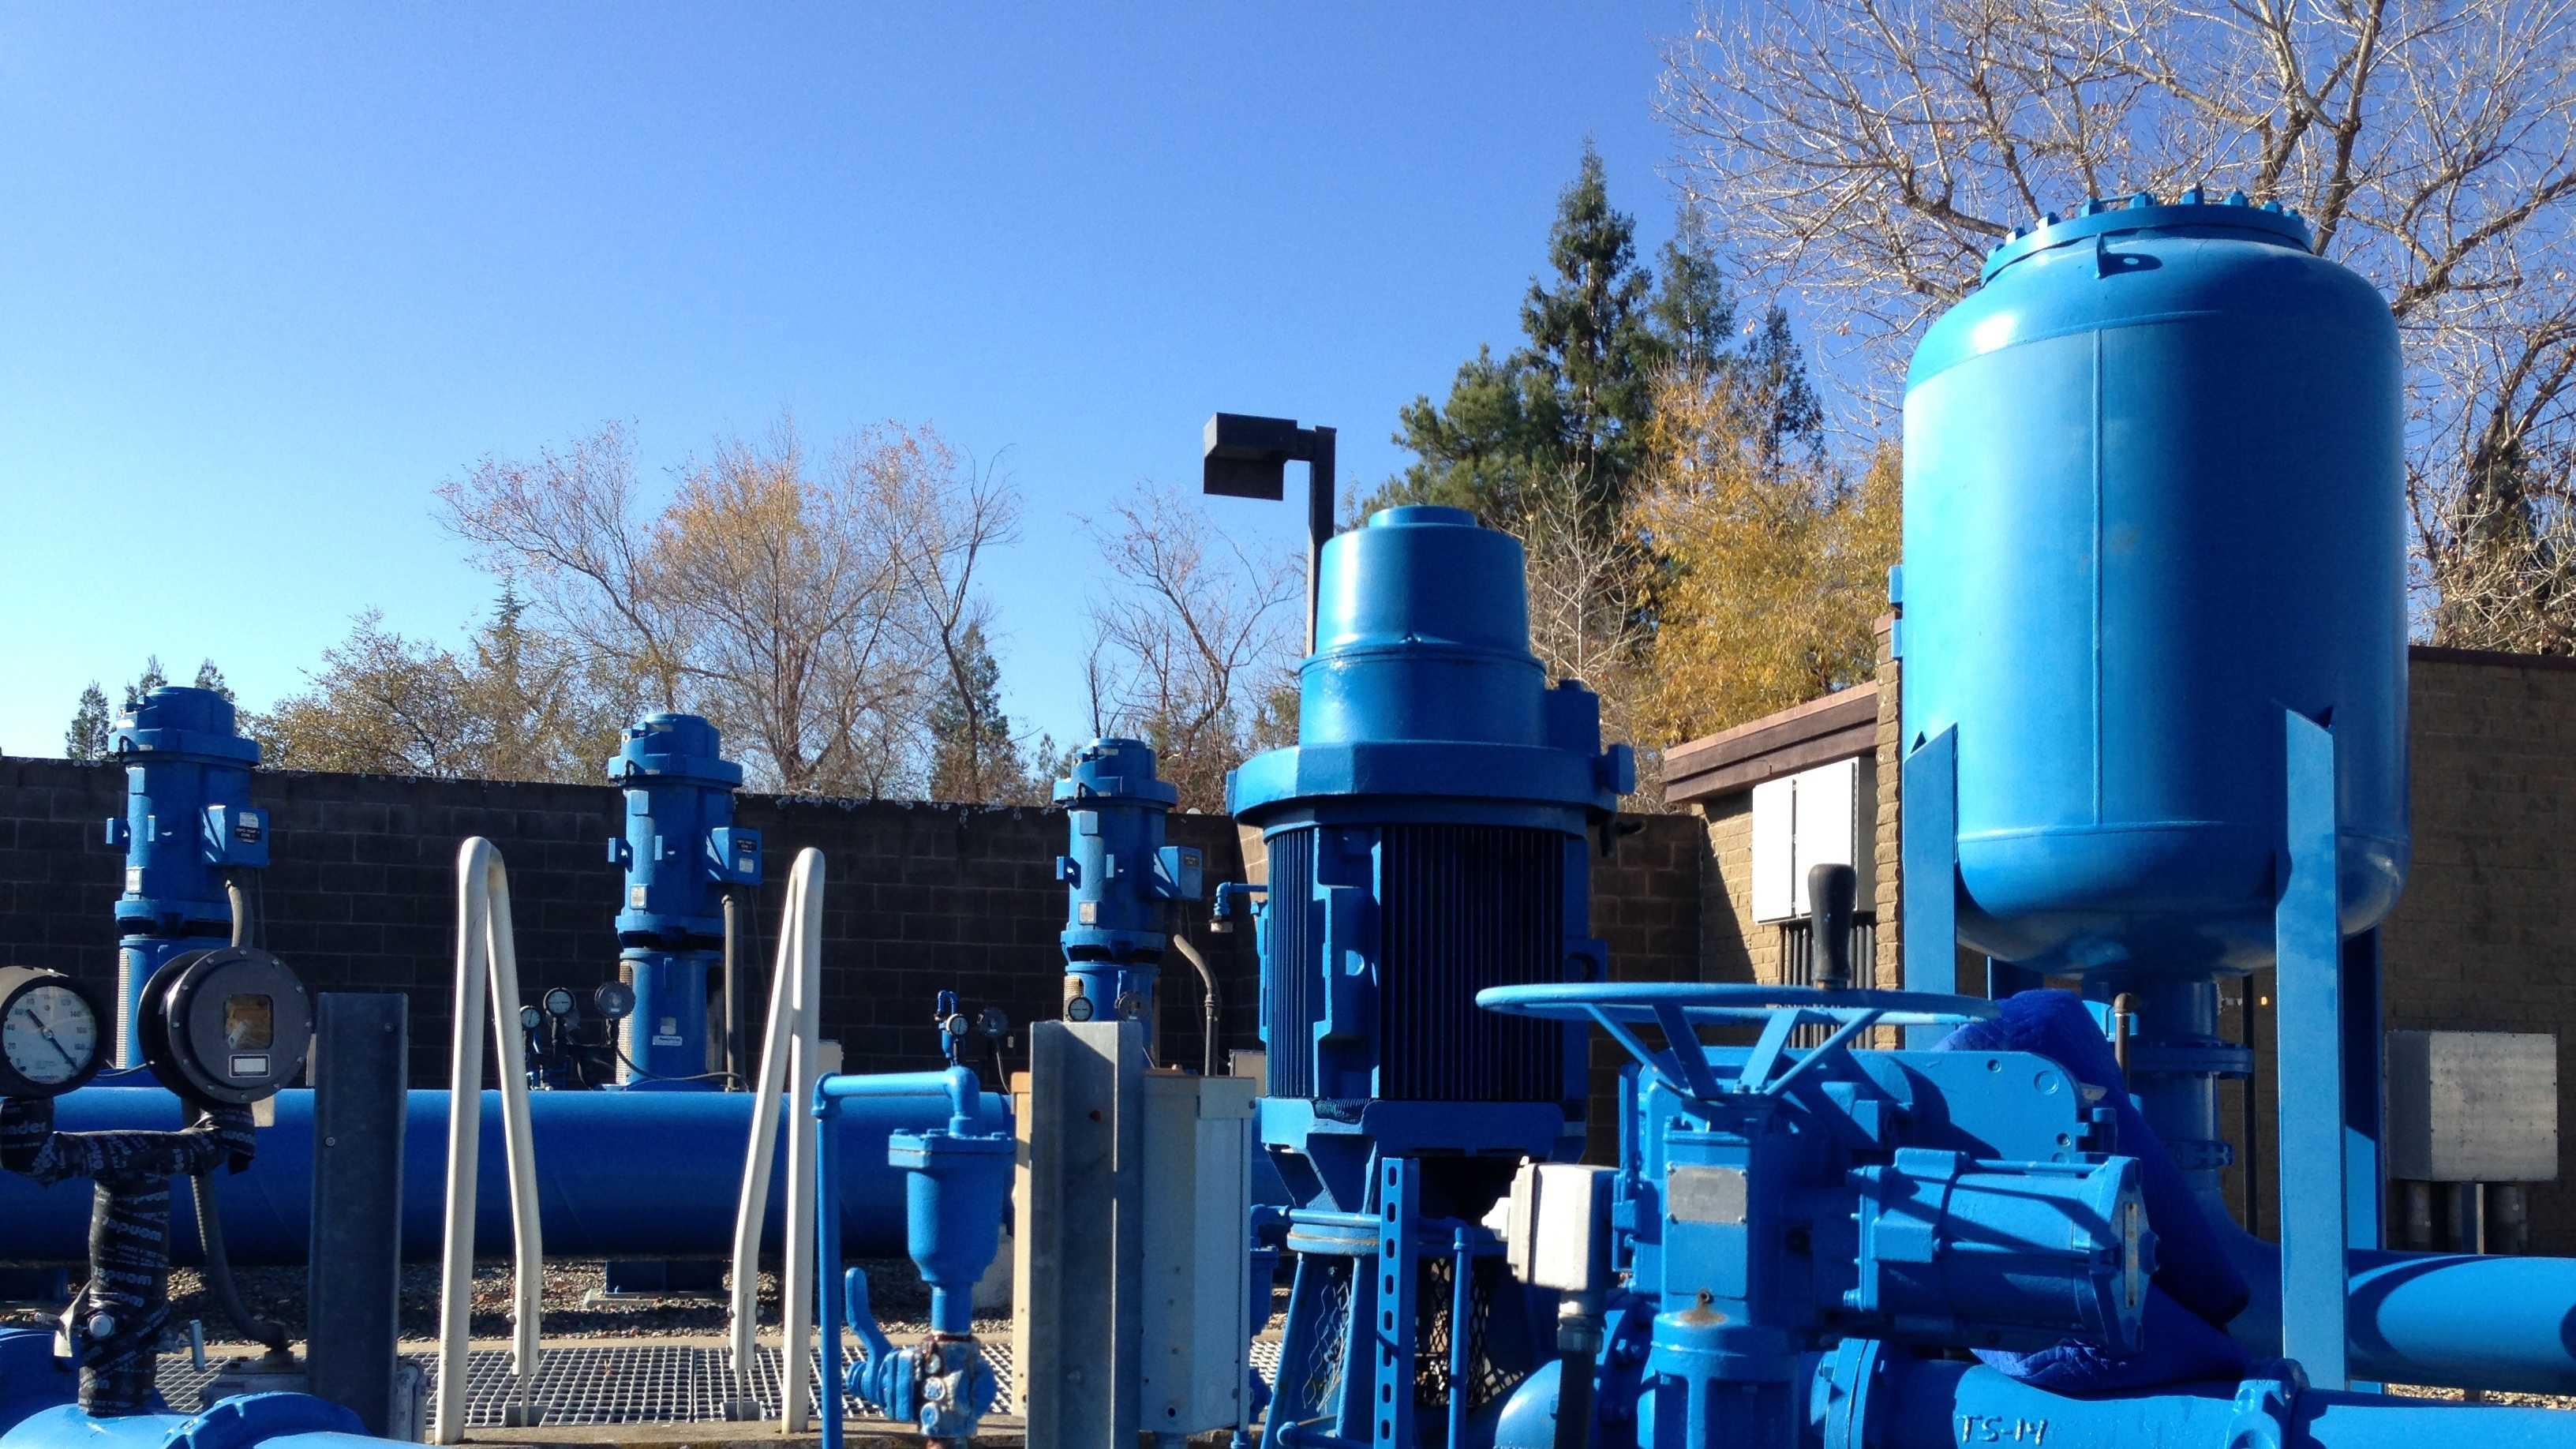 Folsom Water Pumping Plant